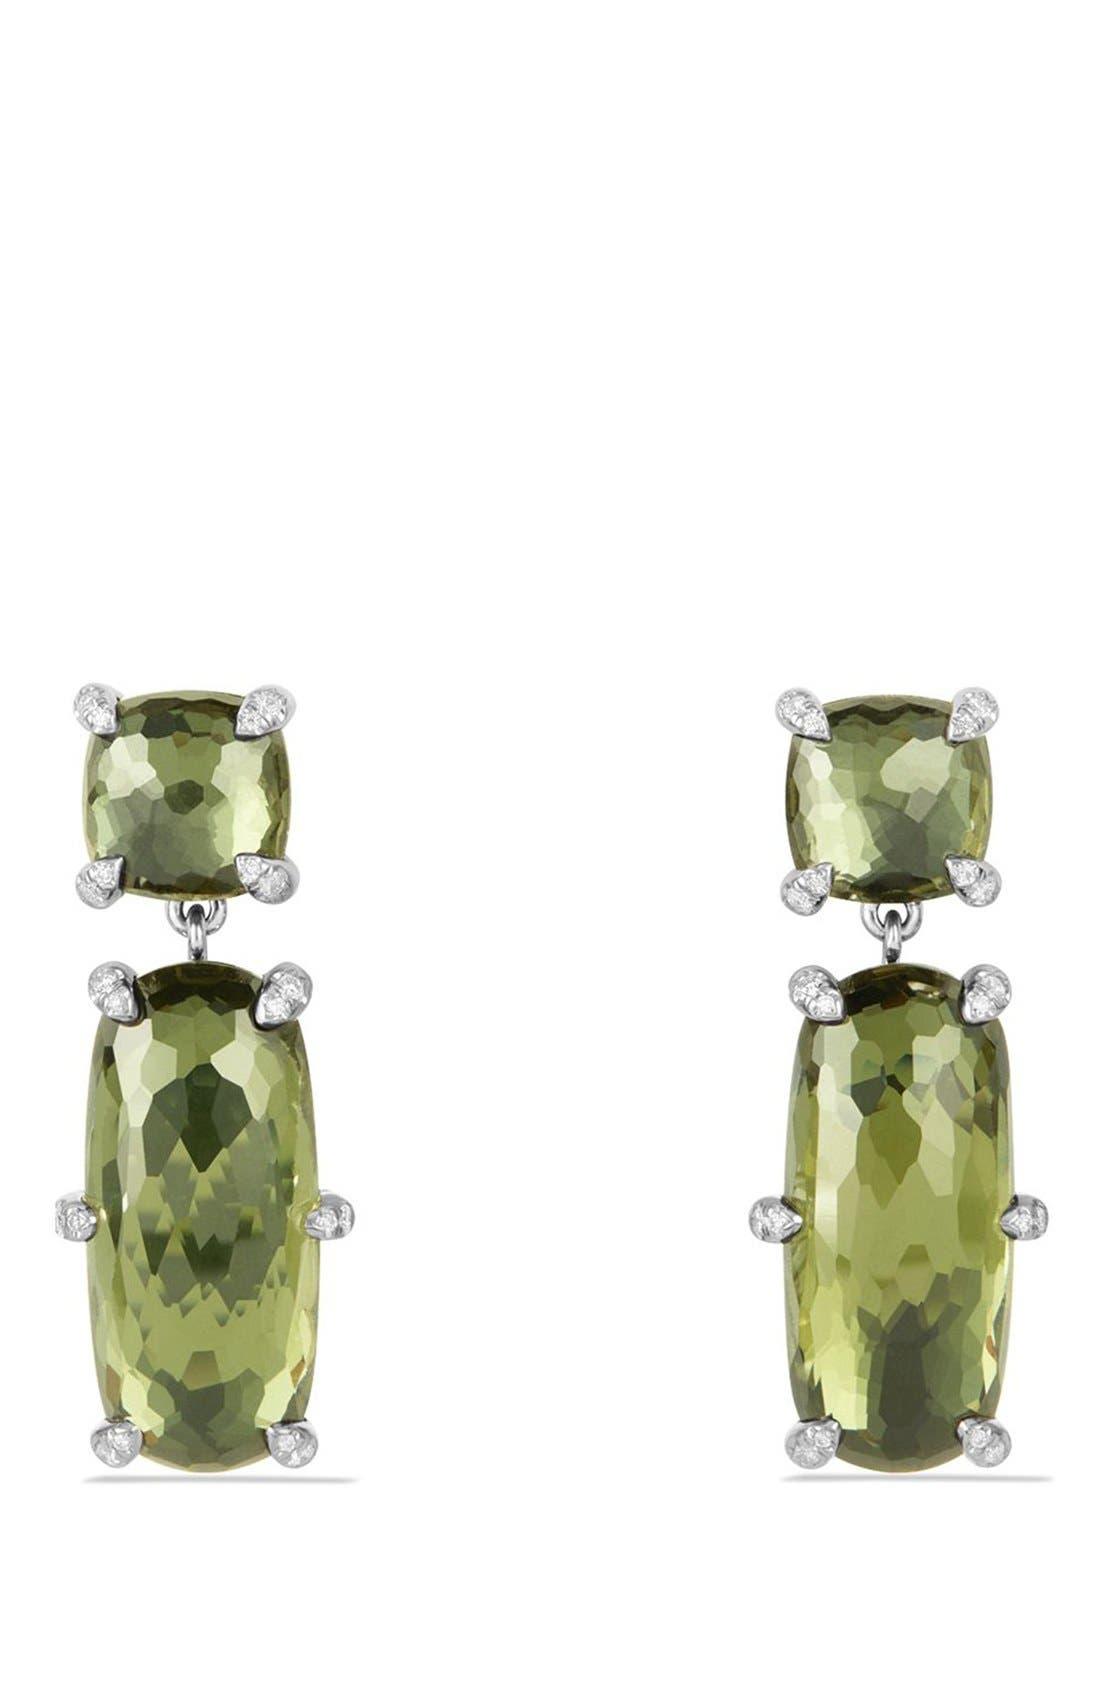 DAVID YURMAN Châtelaine Double Drop Earrings